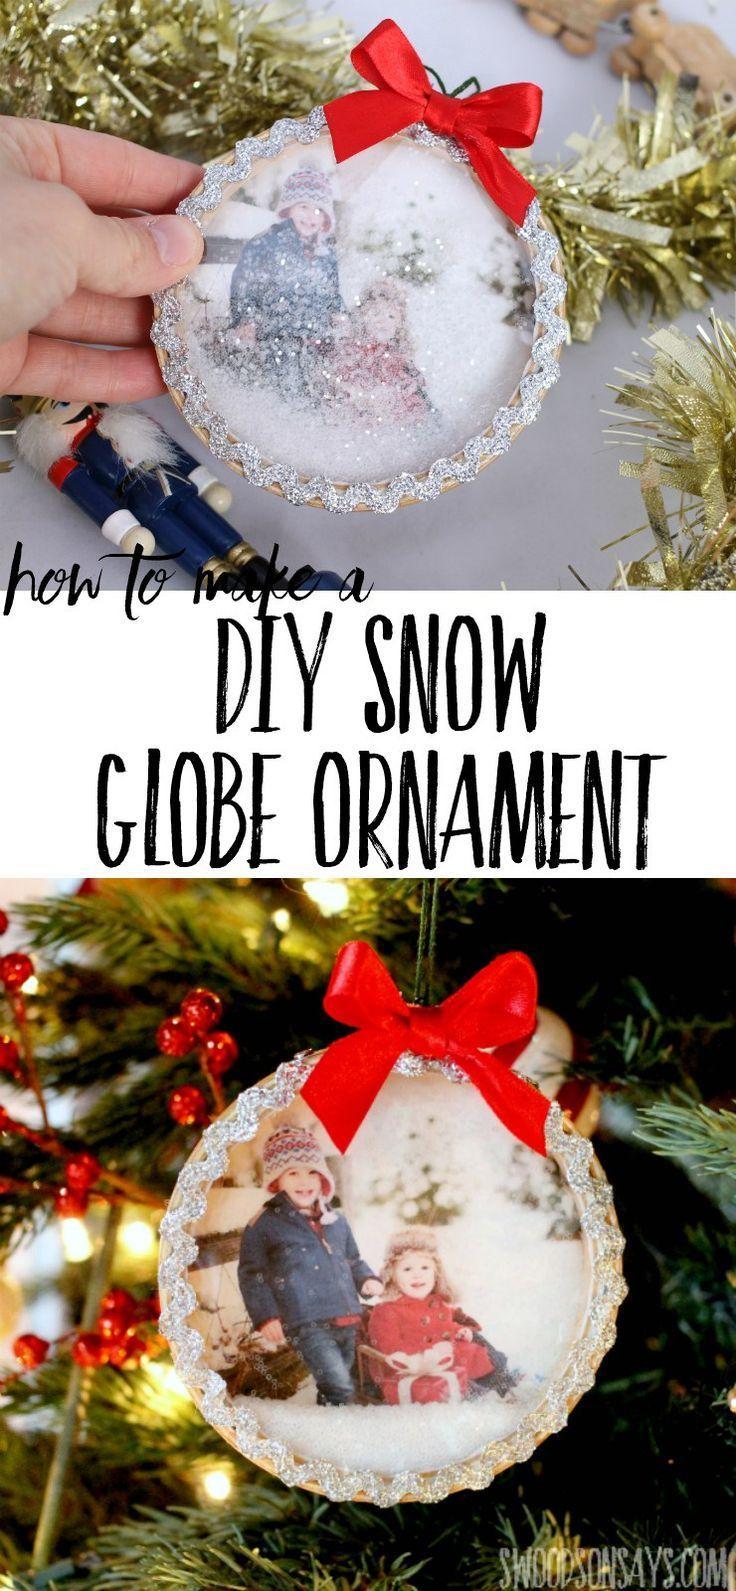 Diy Snow Globe Ornament Diy Christmas Tree Ornaments Christmas Diy Kids Photo Christmas Ornaments